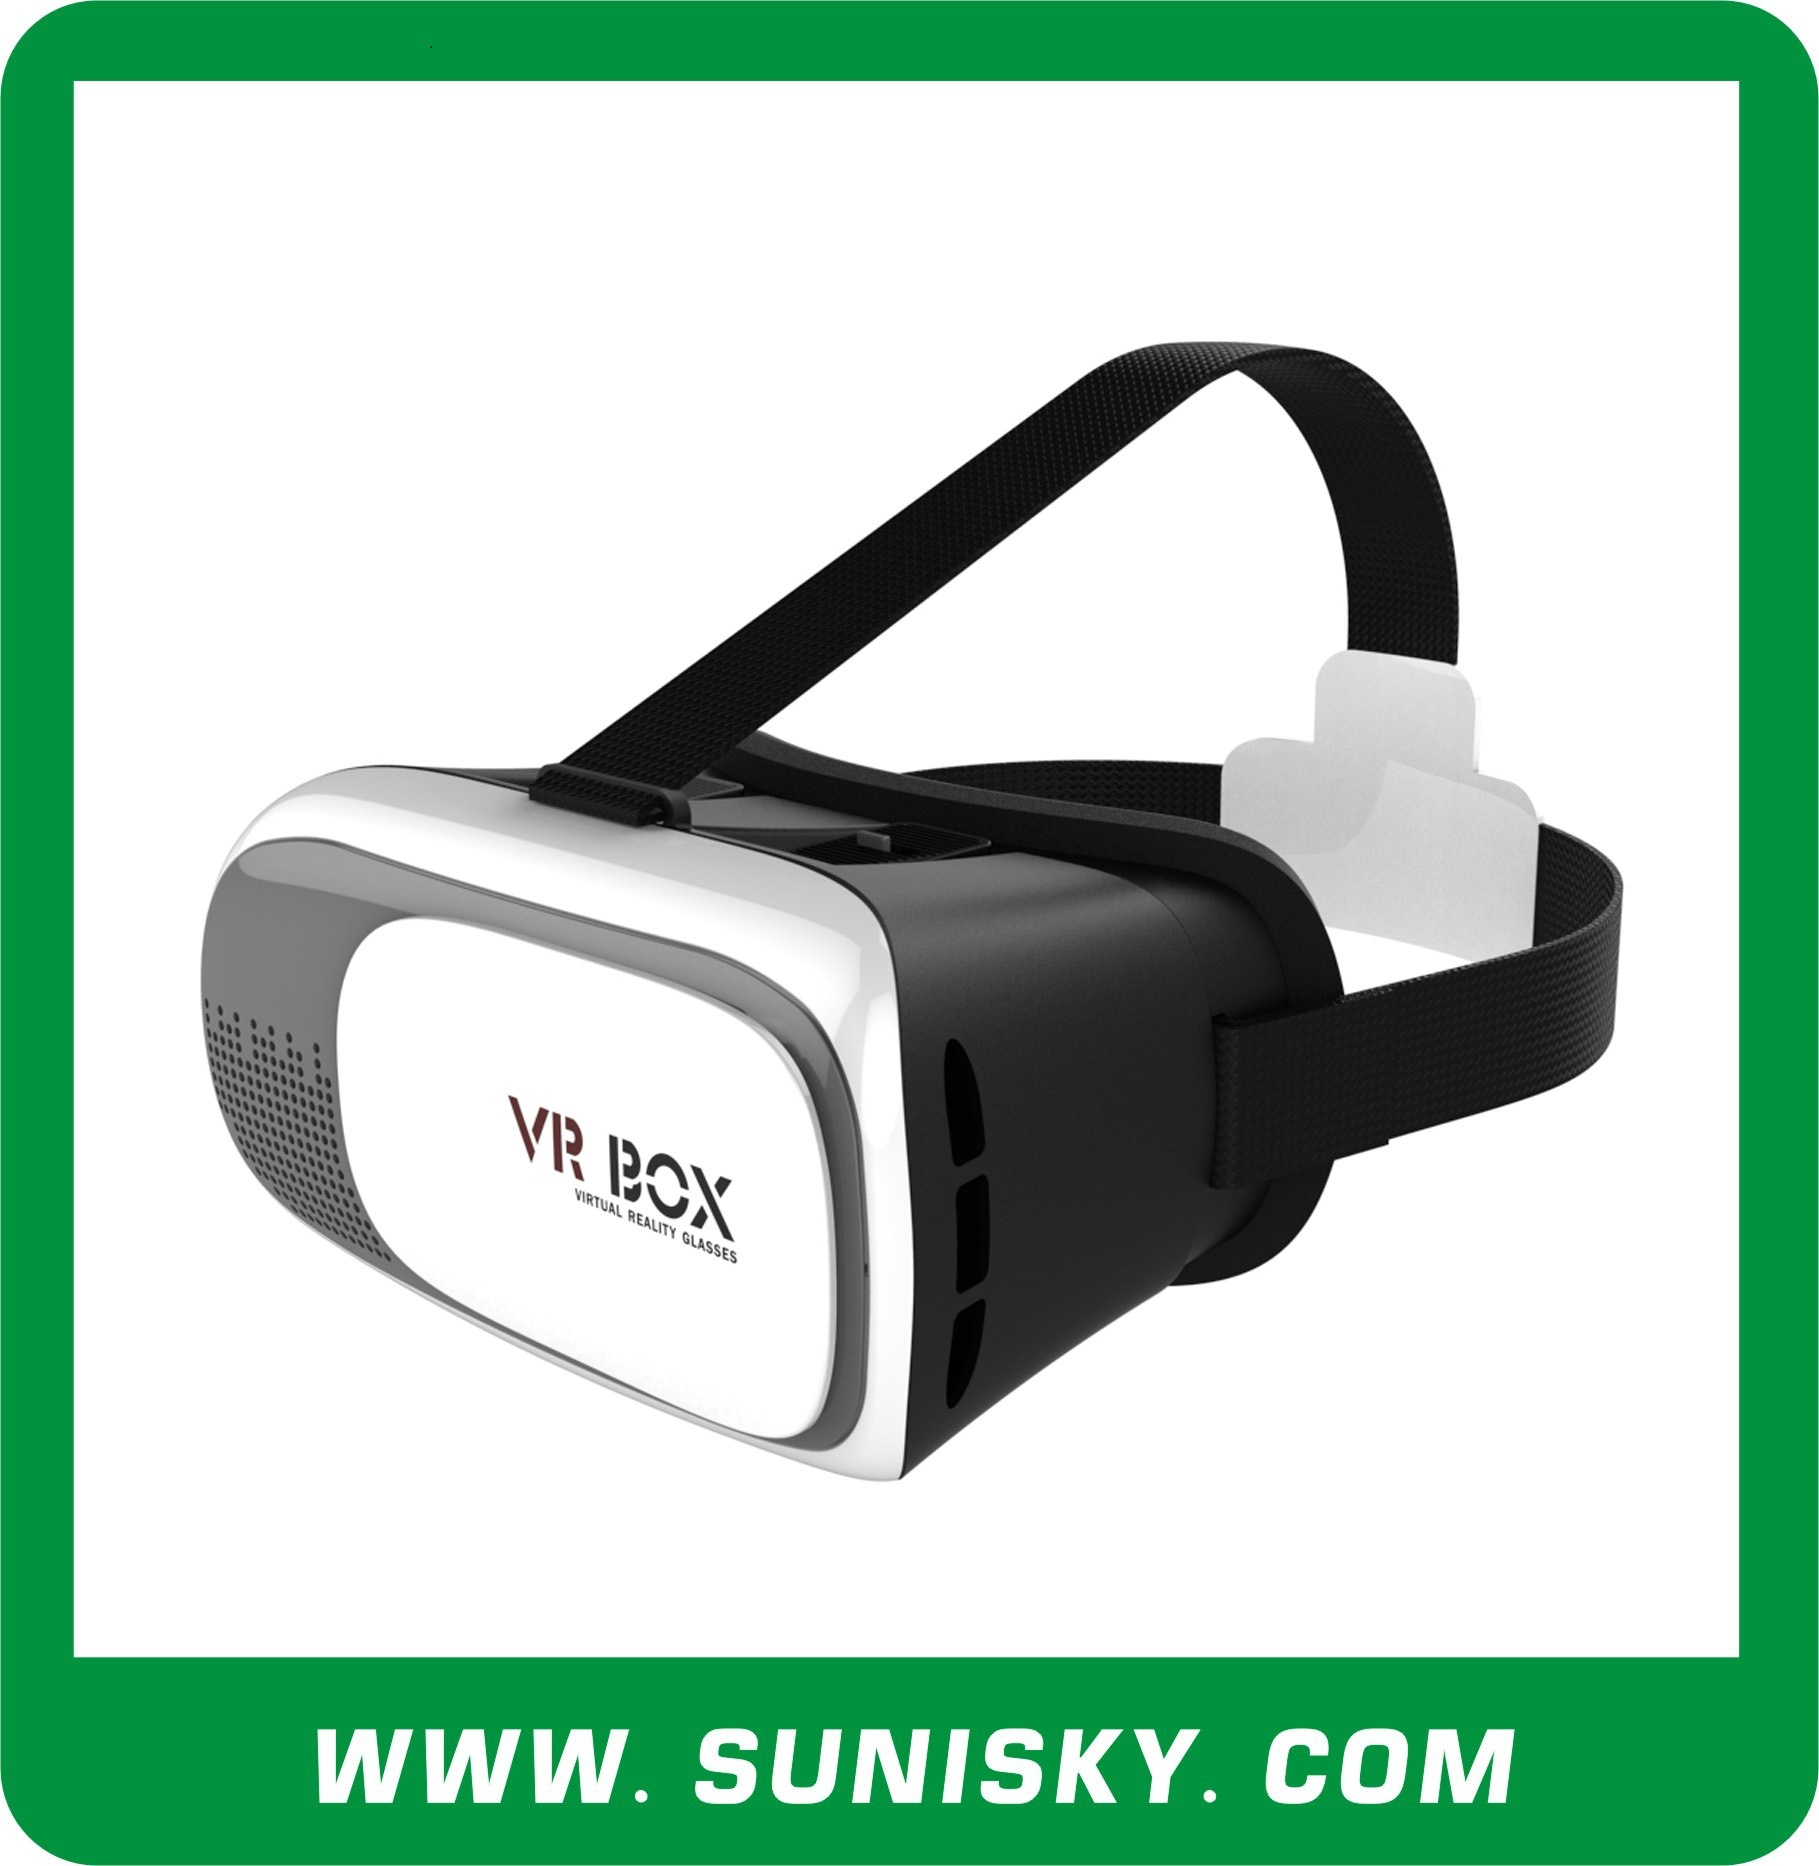 Virtual Reality Headset 3D Glasses Vr Box Vr Glasses (VR-02)